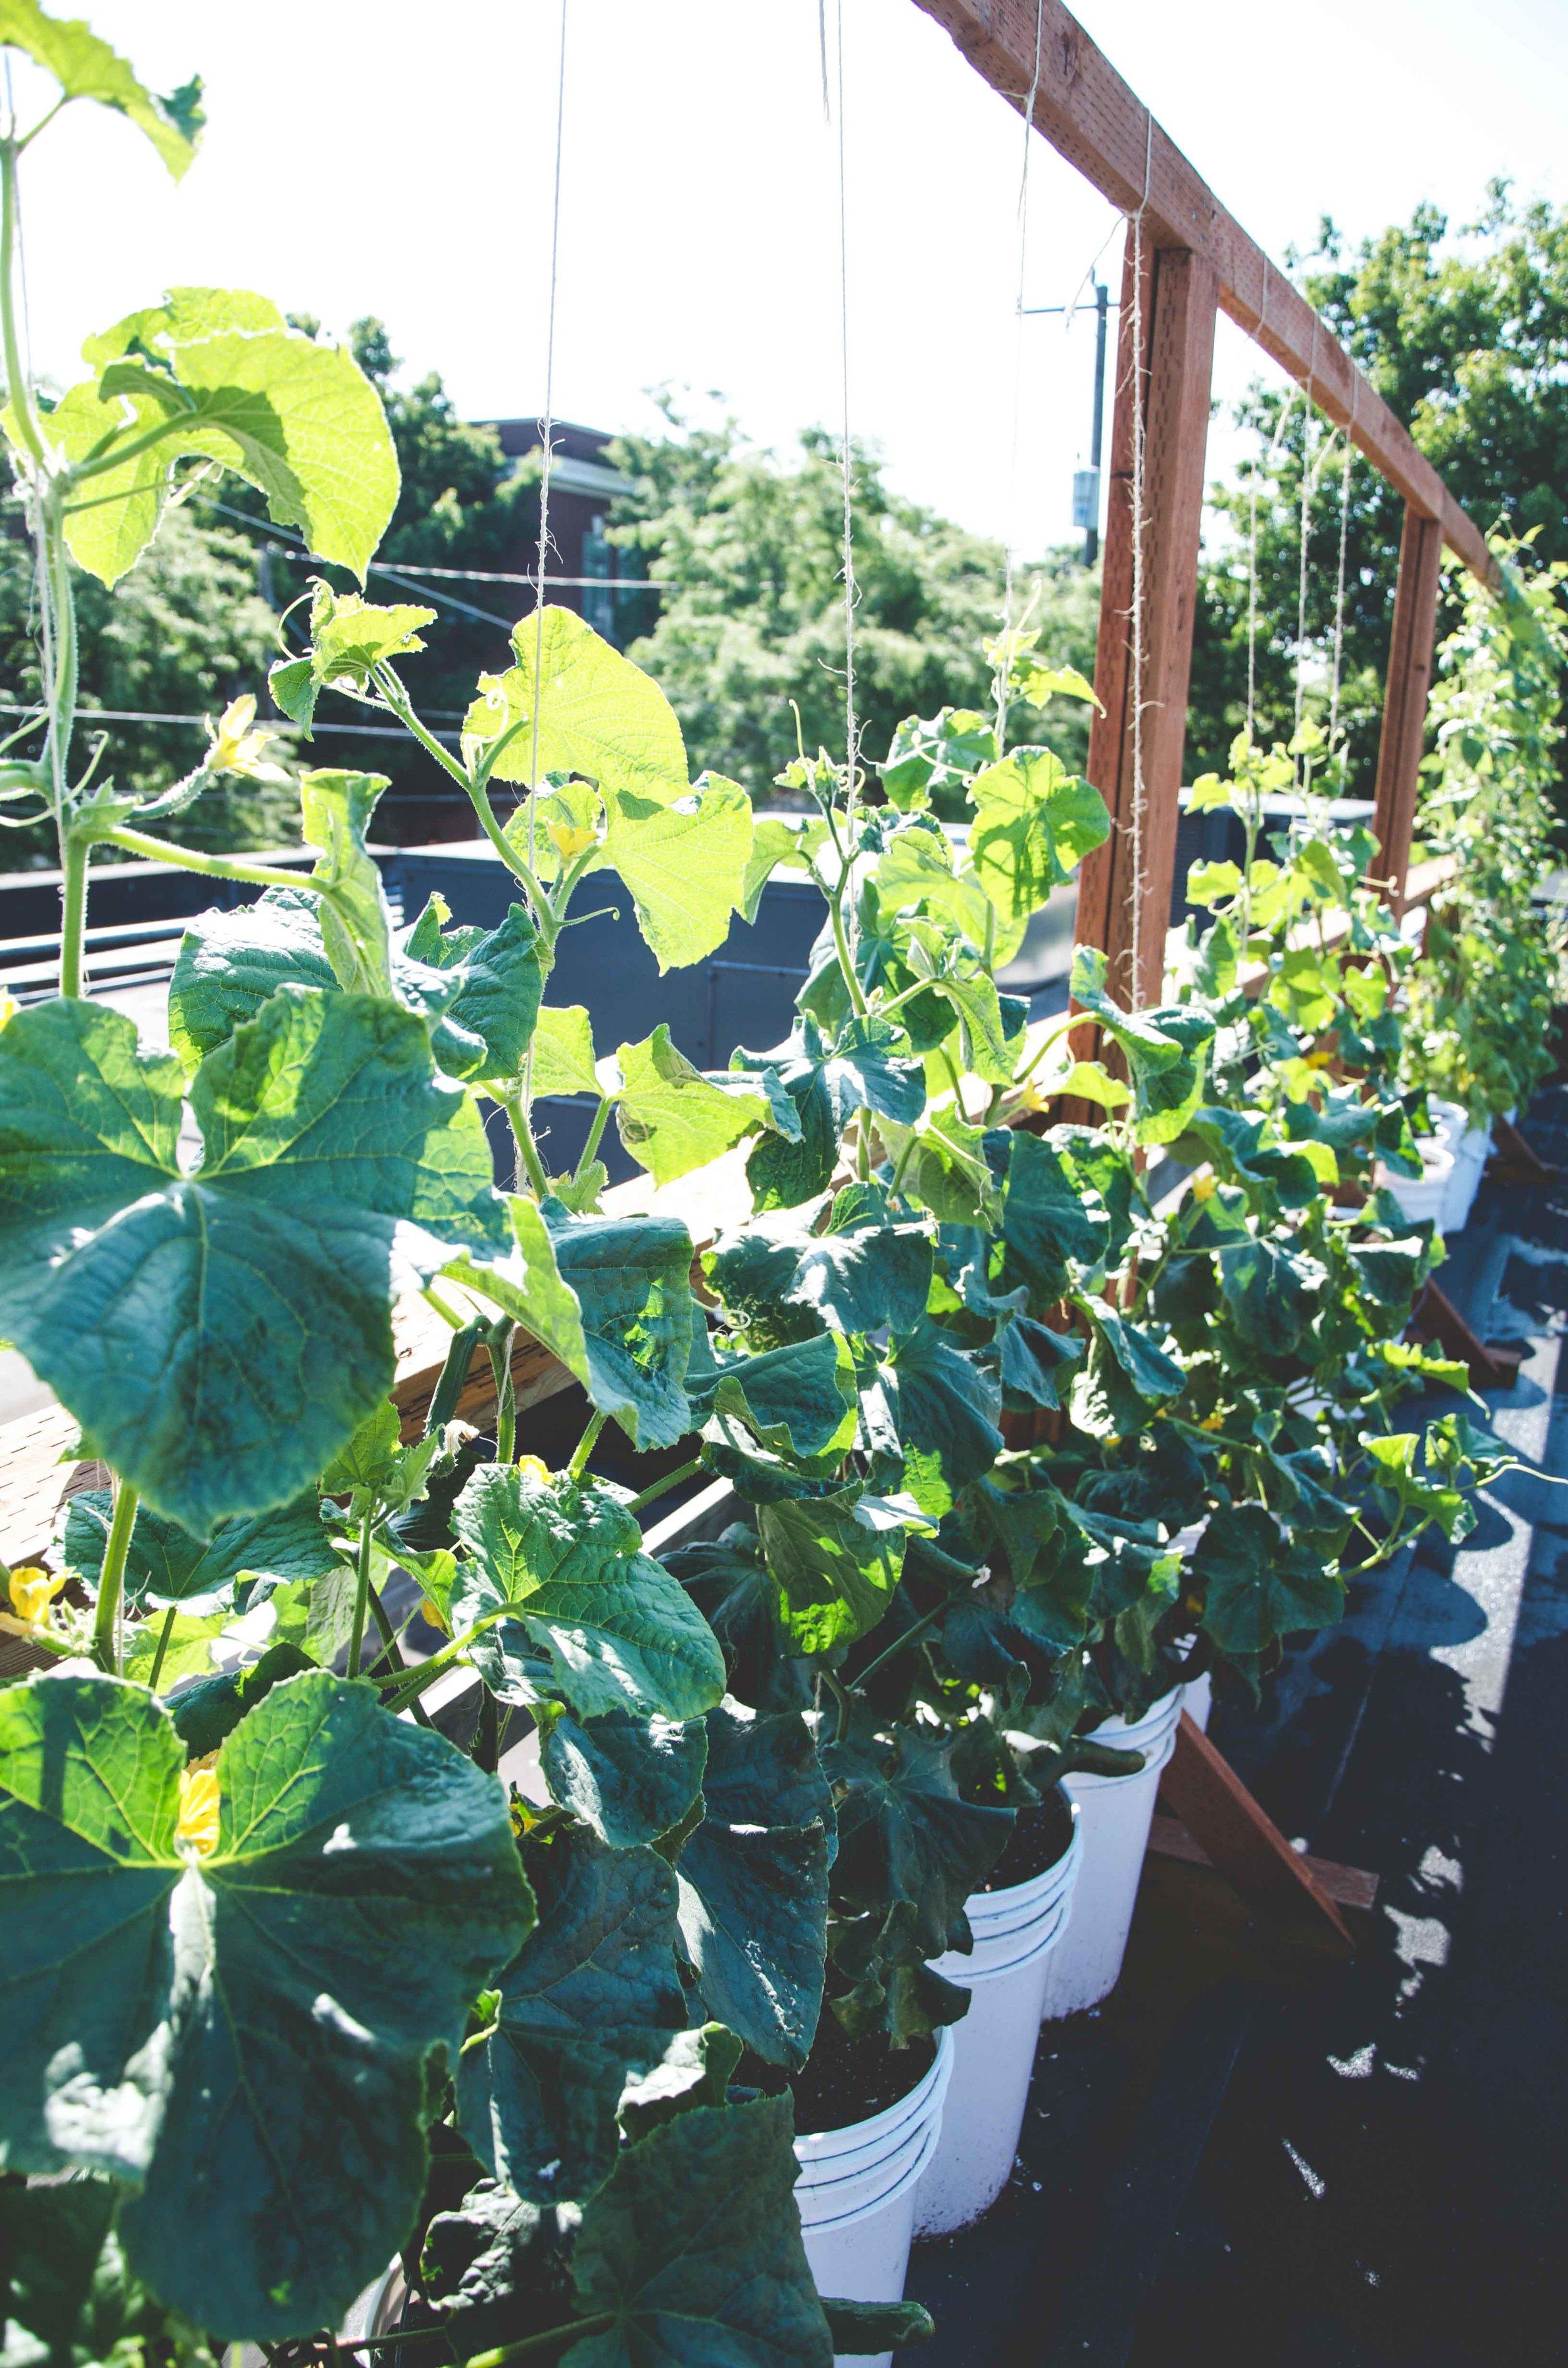 Cucumbers   -  Photo by Seattle Urban Farm Company